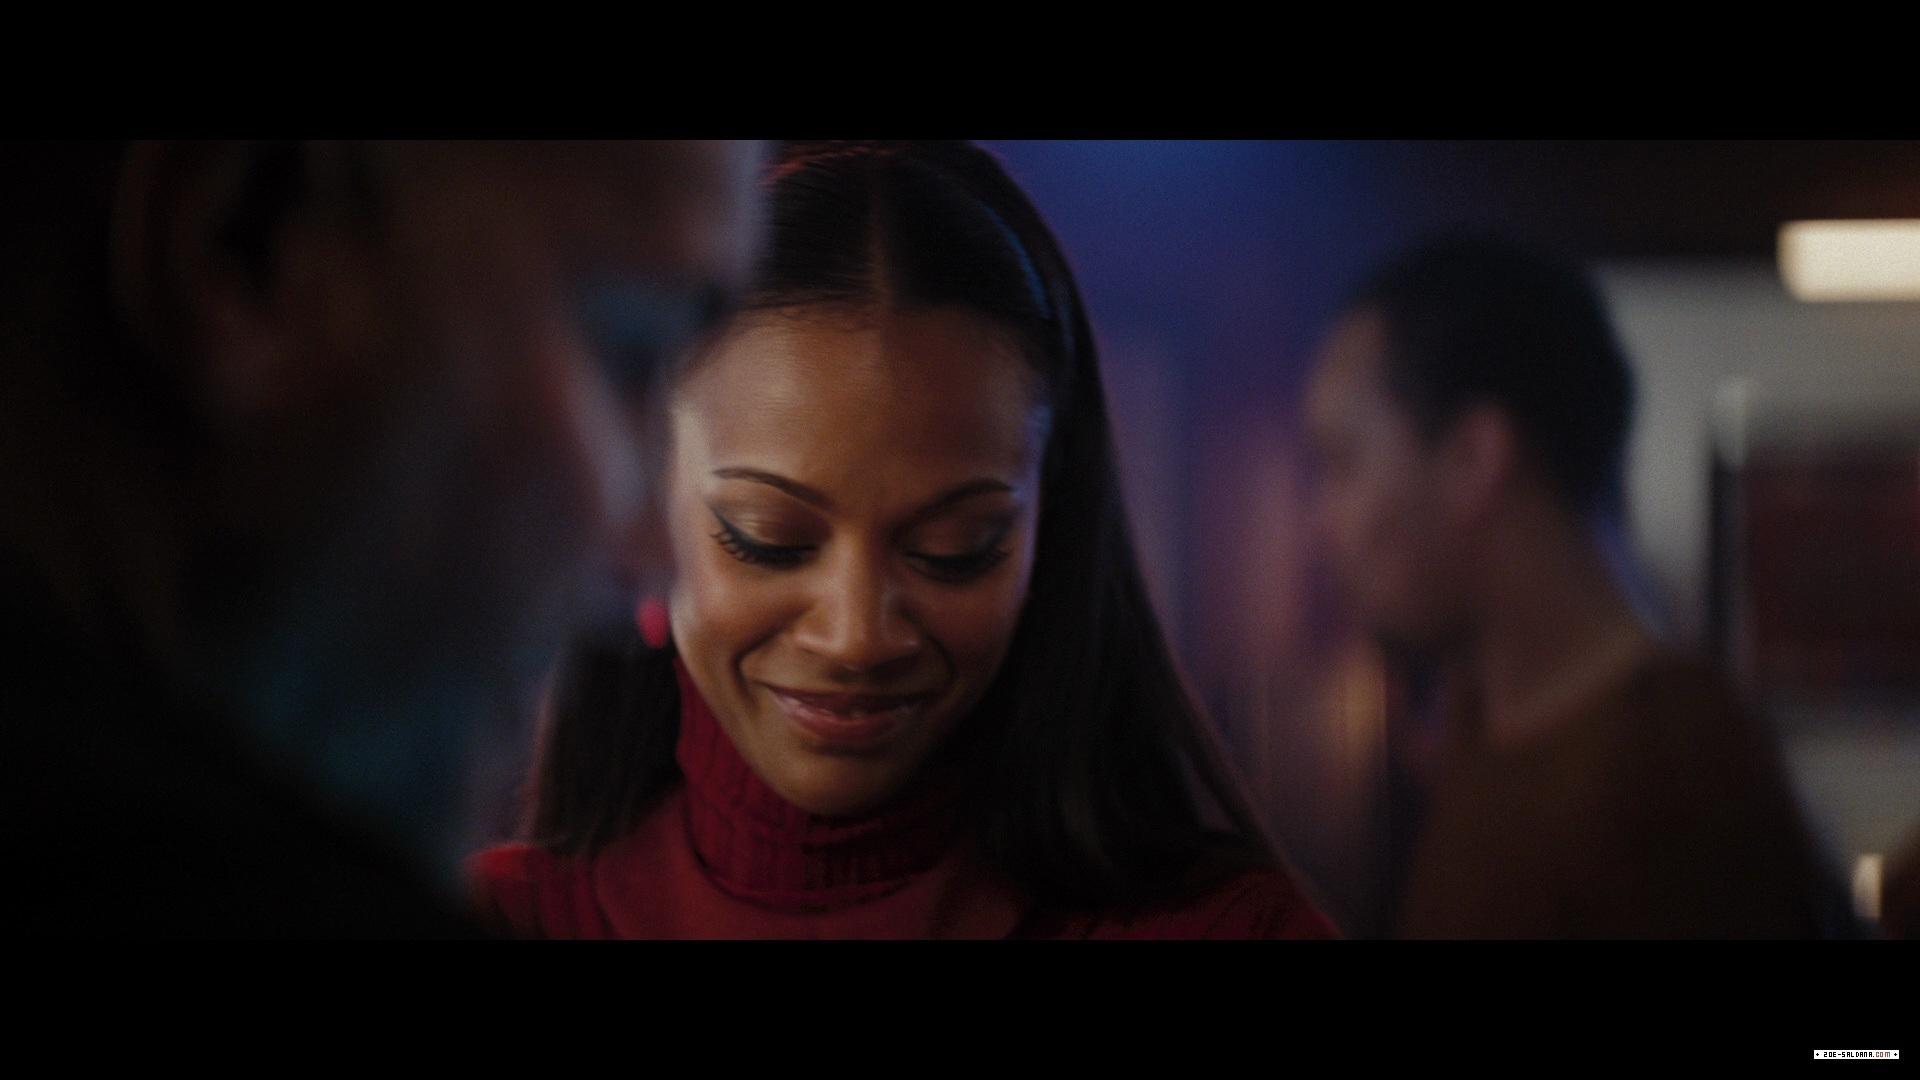 Zoe-Saldana-Star-Trek-screencaps-zoe-saldana-9857676-1920-1080 jpgZoe Saldana Star Trek